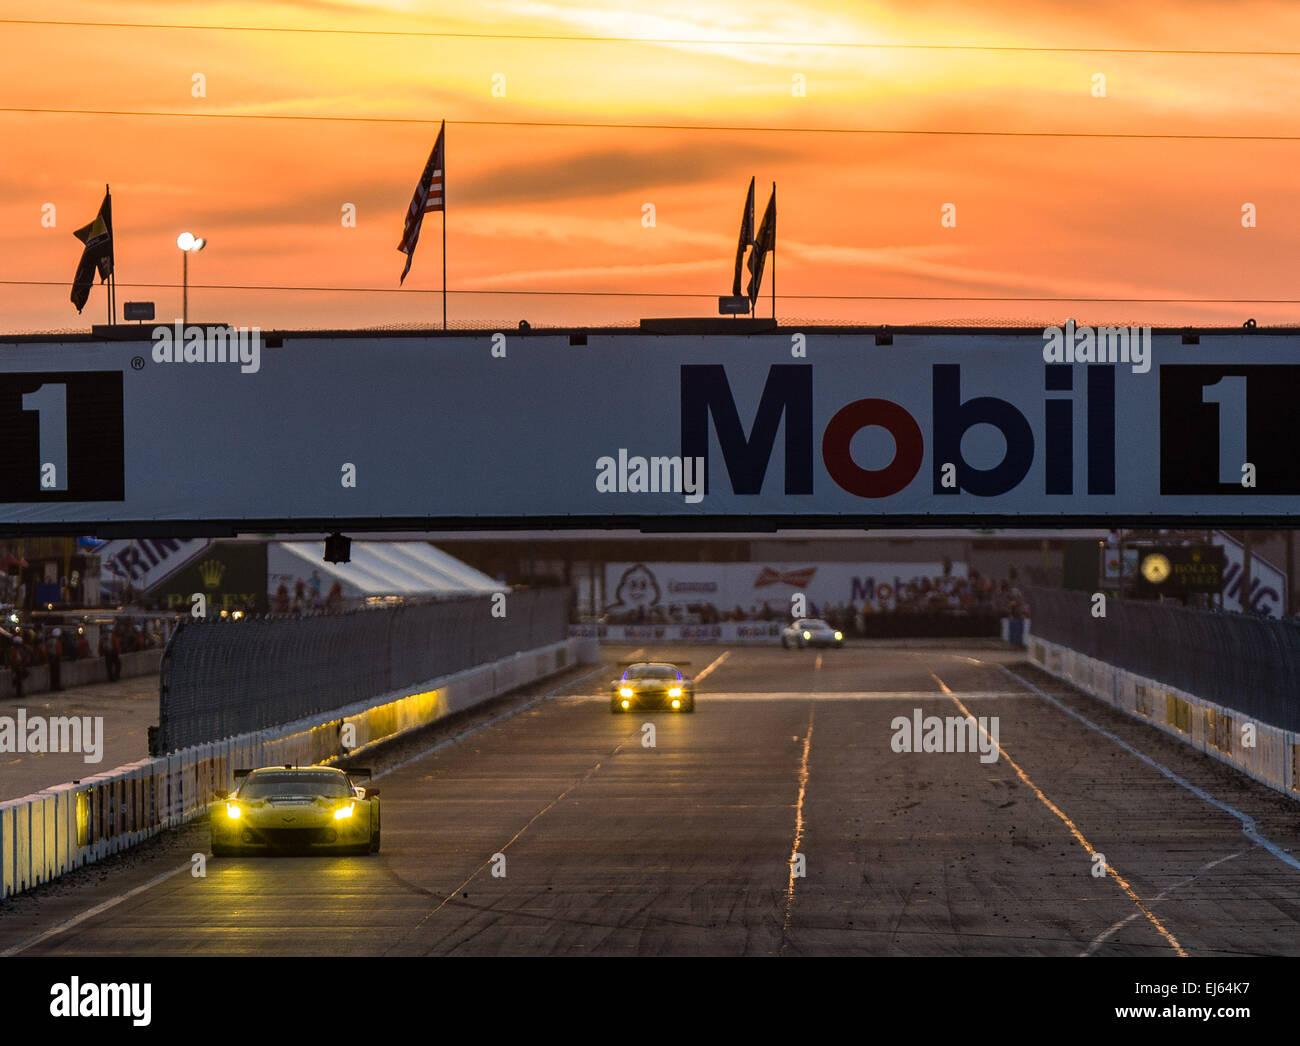 Sebring International Raceway Stock Photos & Sebring